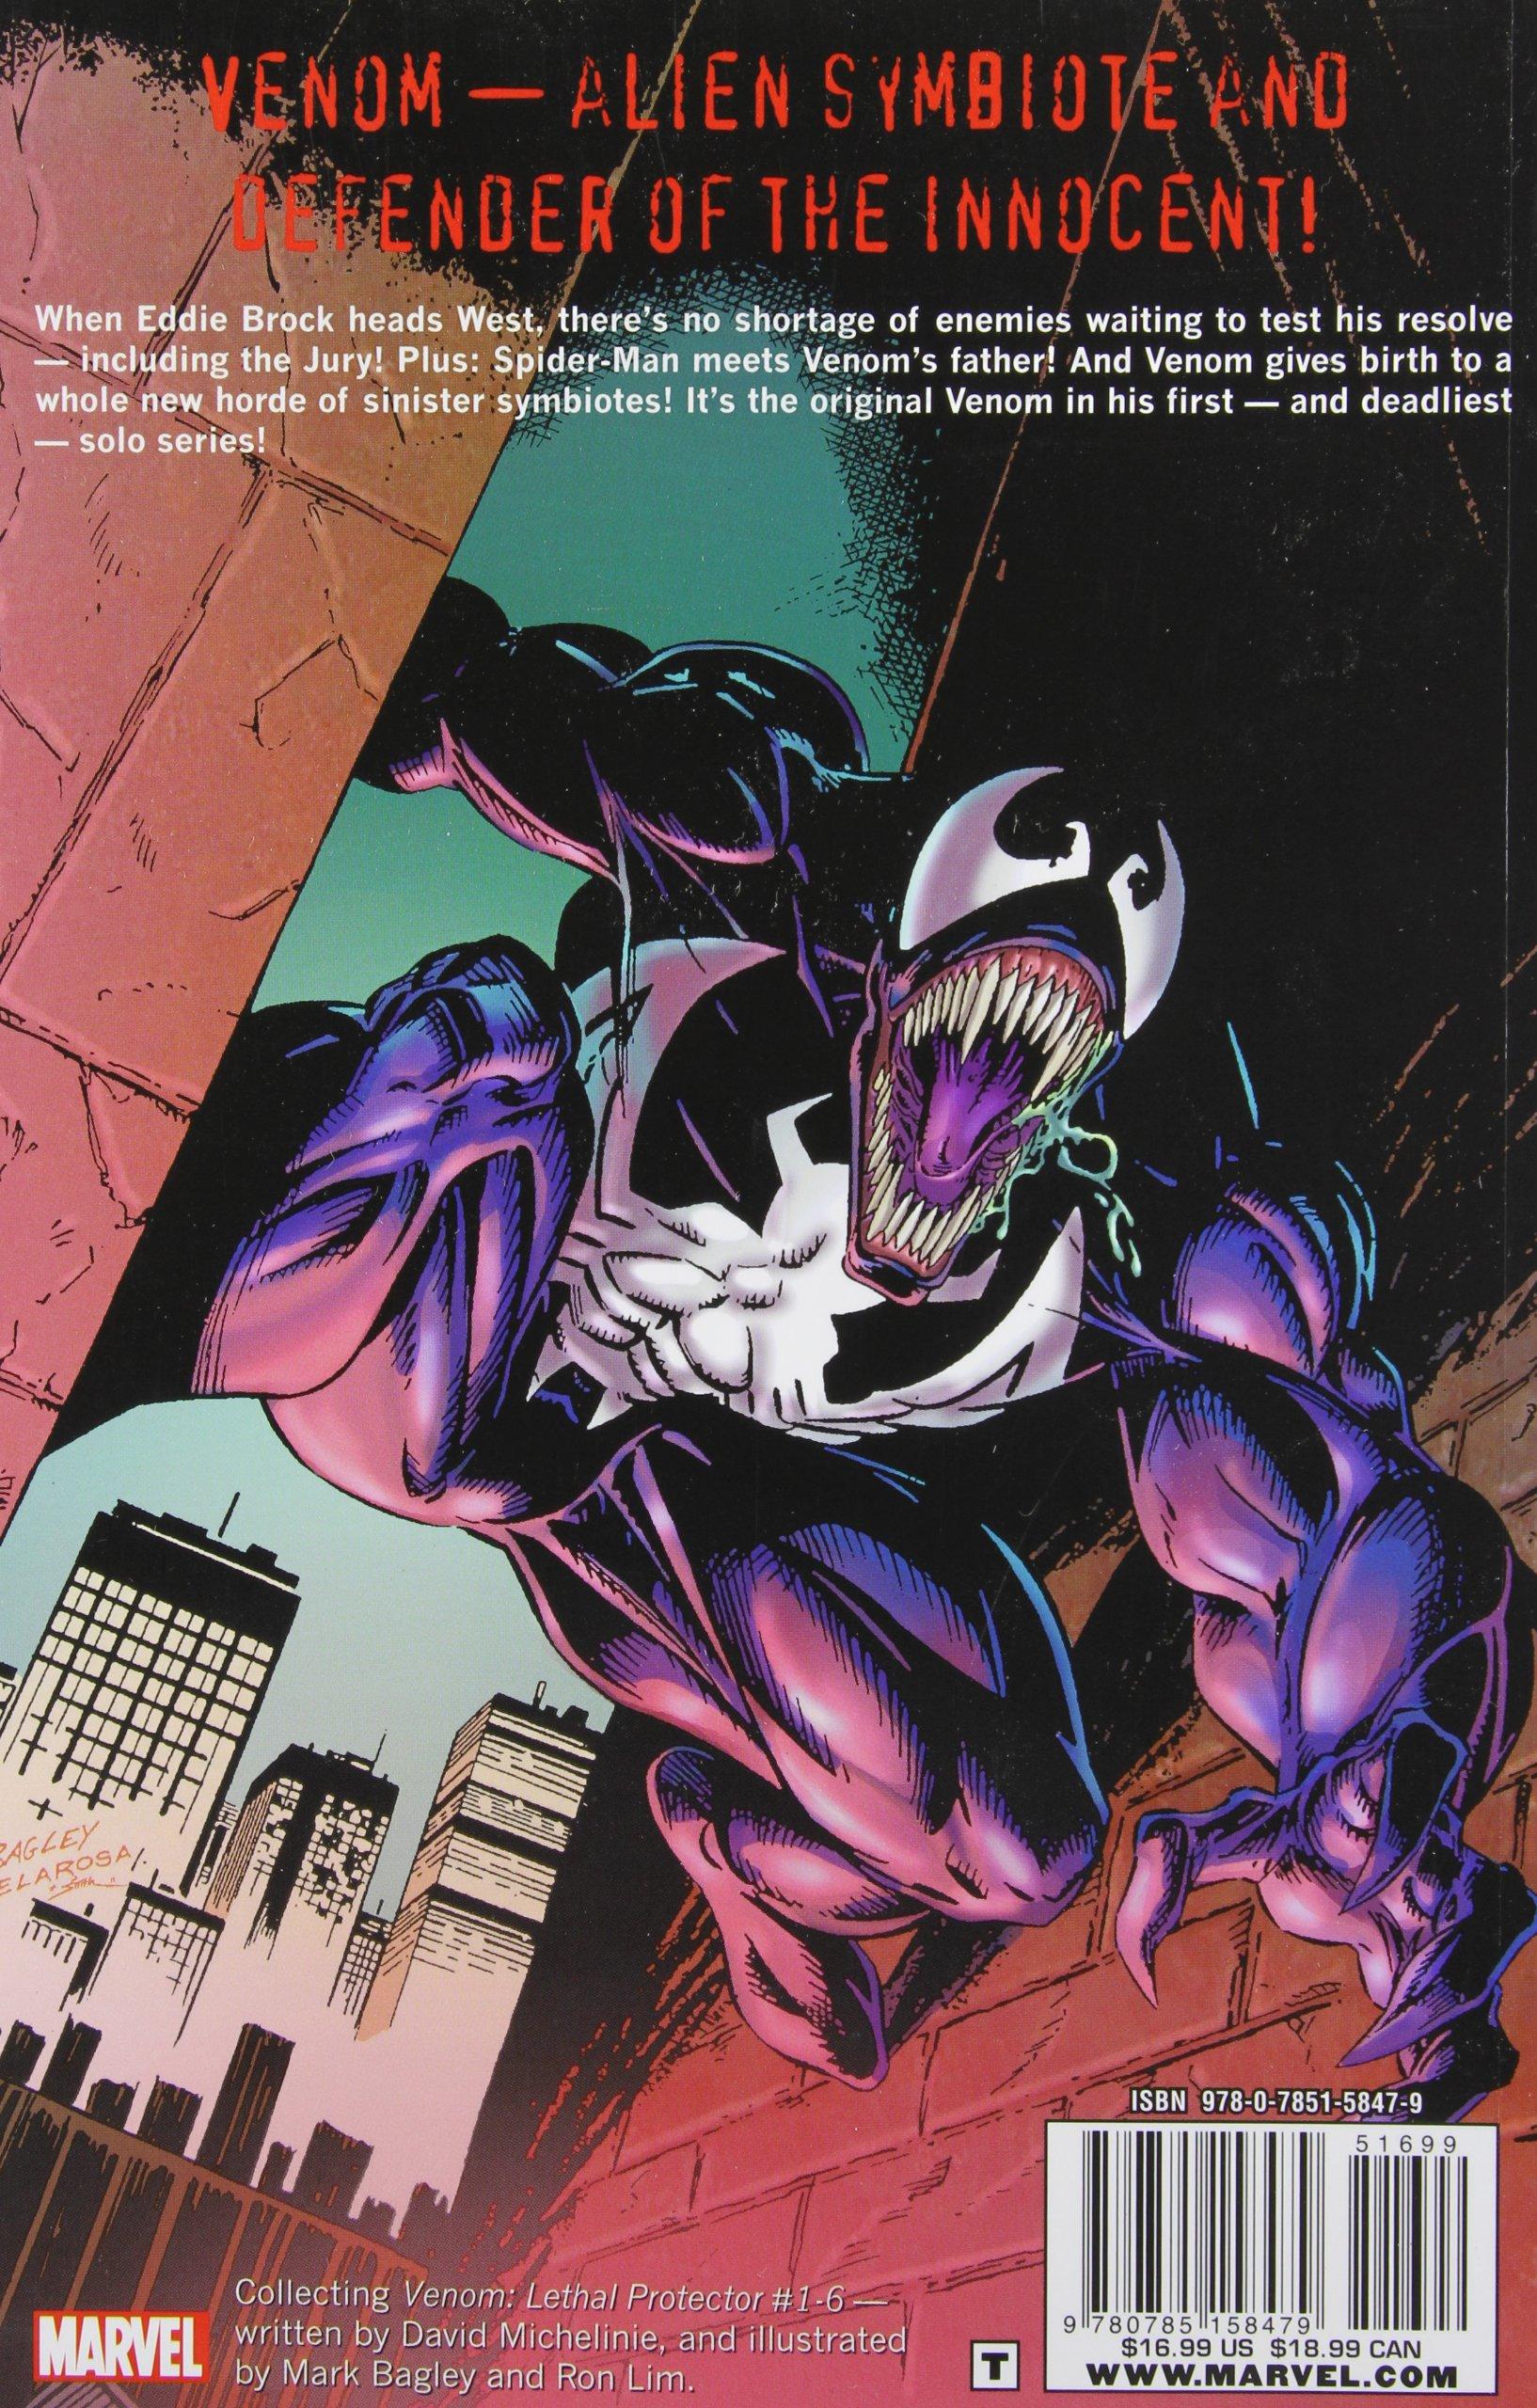 Amazon: Venom: Lethal Protector (9780785158479): David Michelinie, Mark  Bagley, Ron Lim: Books